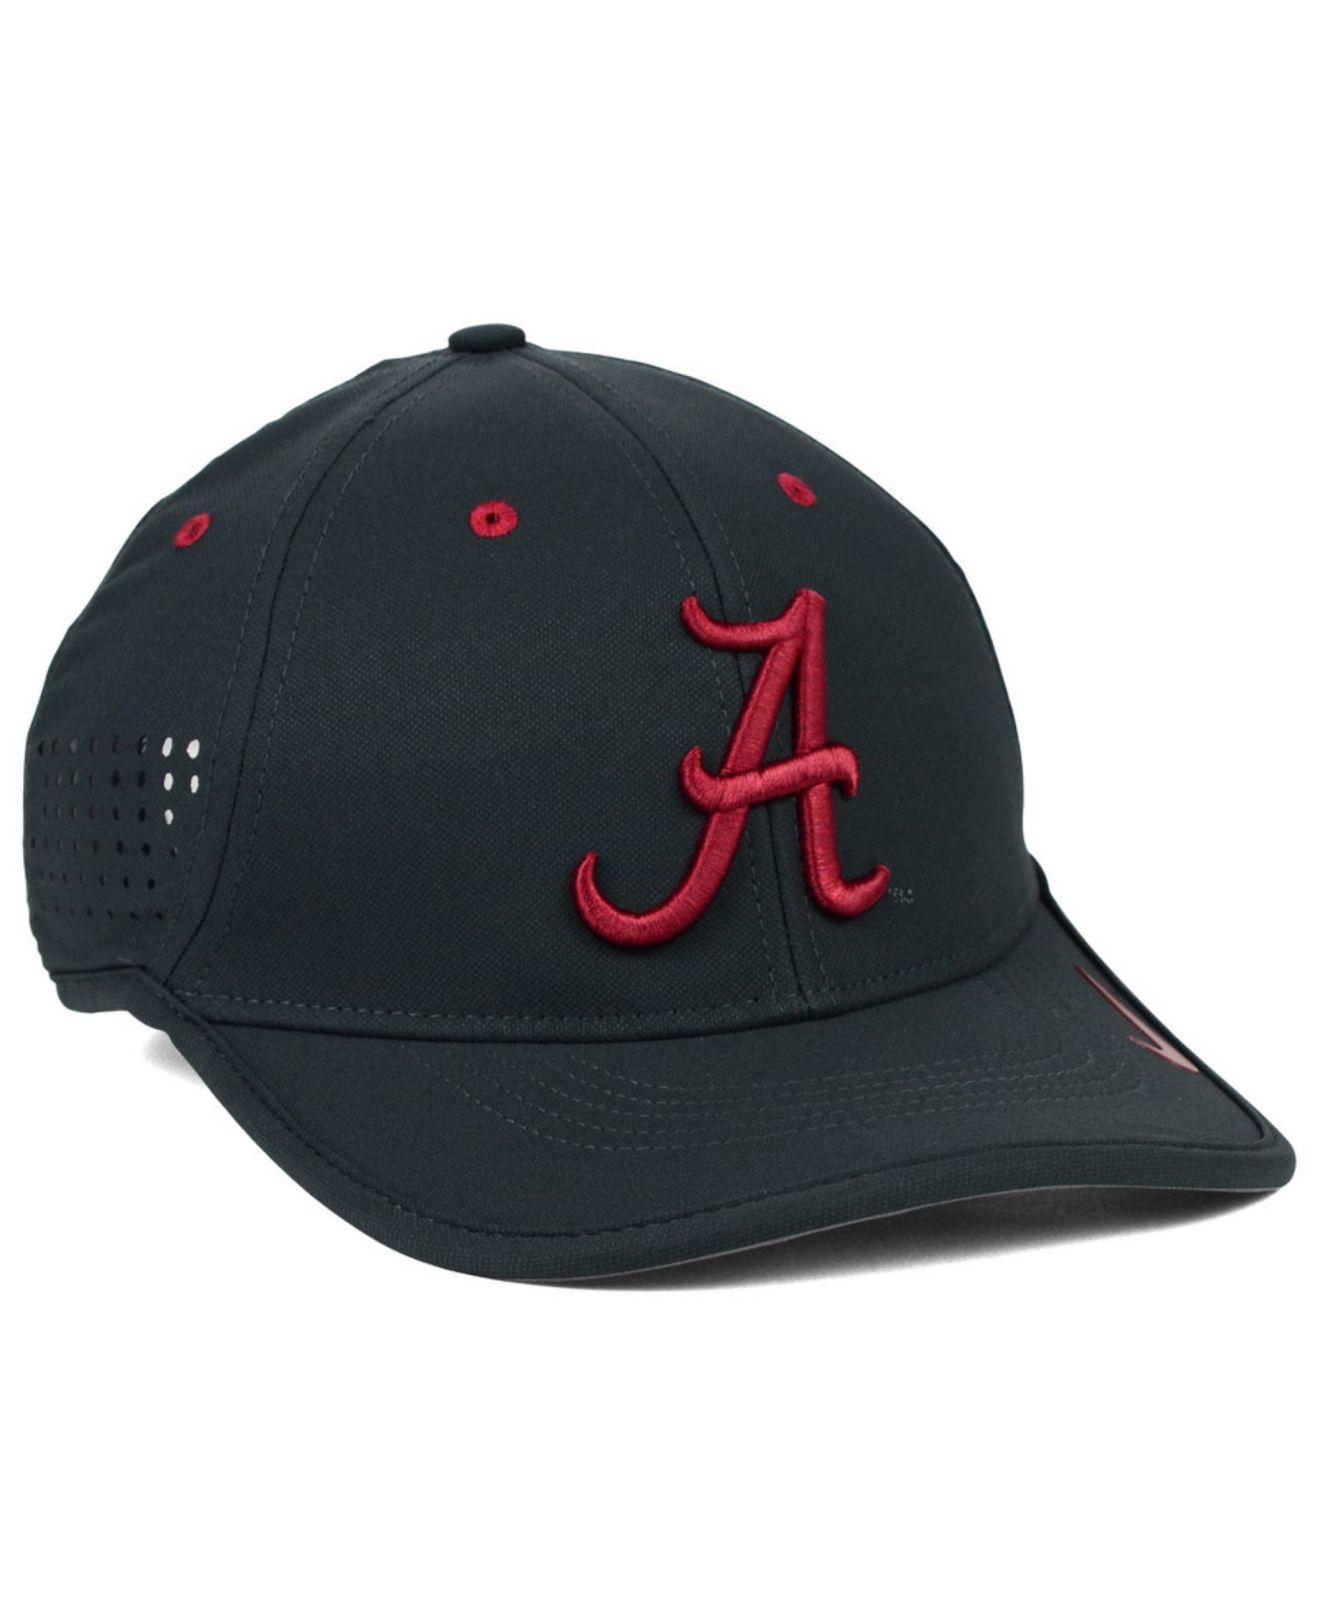 competitive price 4c37d 22d73 ... wholesale lyst nike alabama crimson tide dri fit coaches cap in gray  for men 27be6 4e1c5